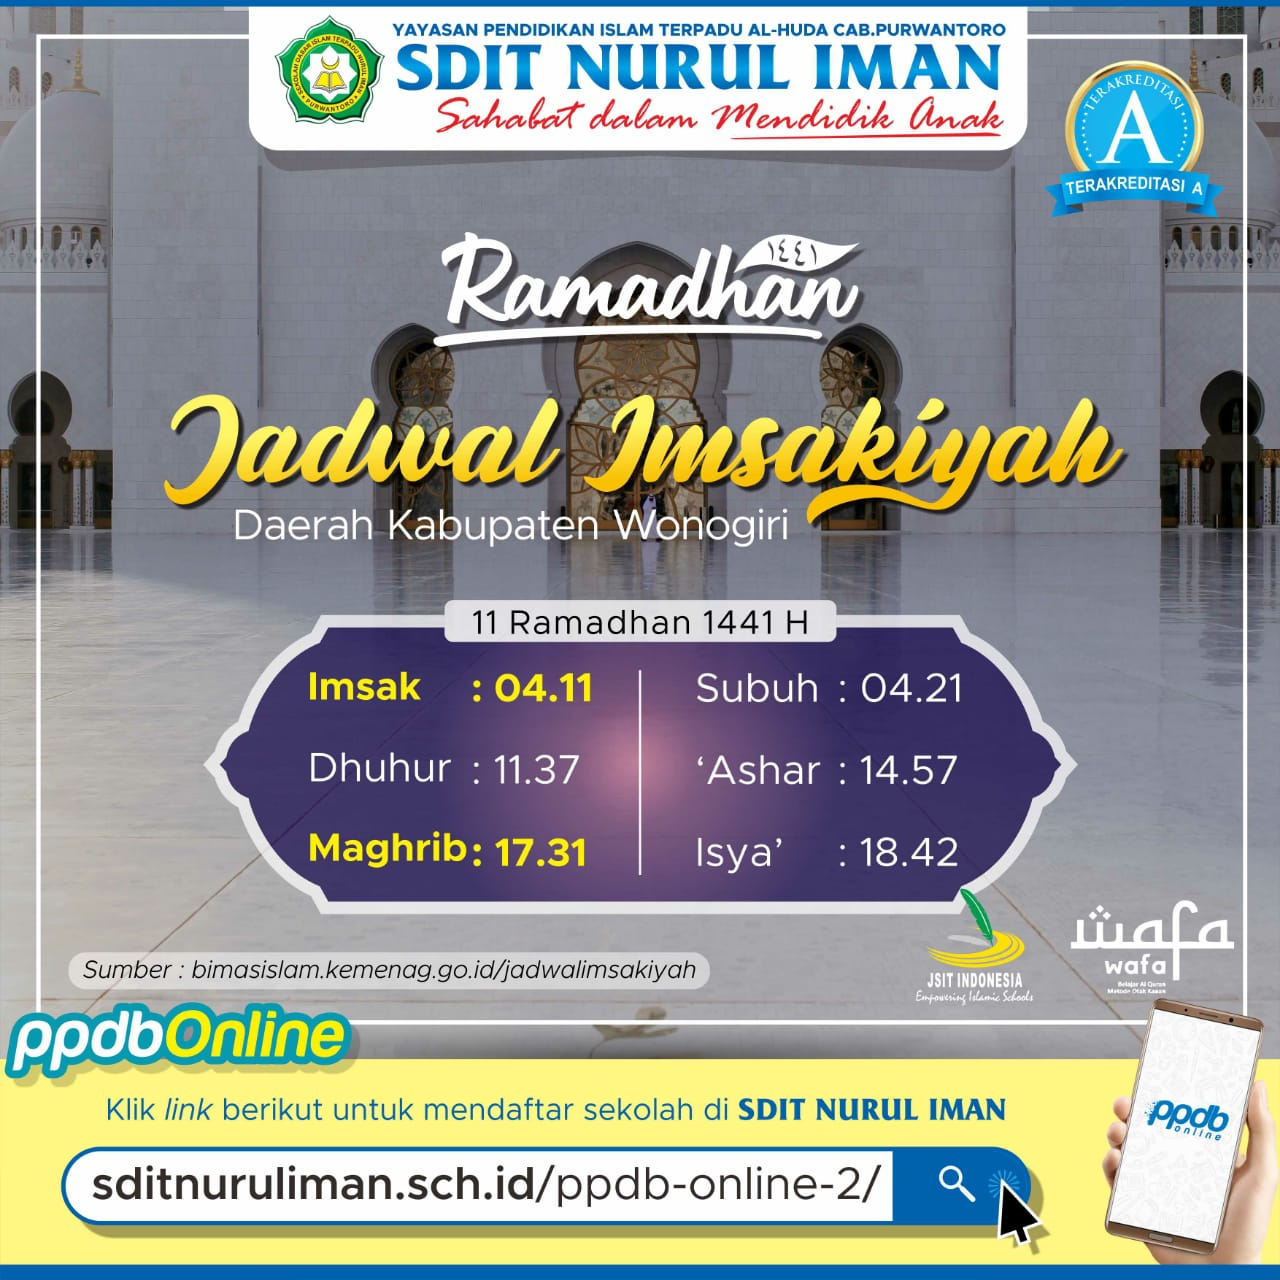 11 Ramadhan 1441 H